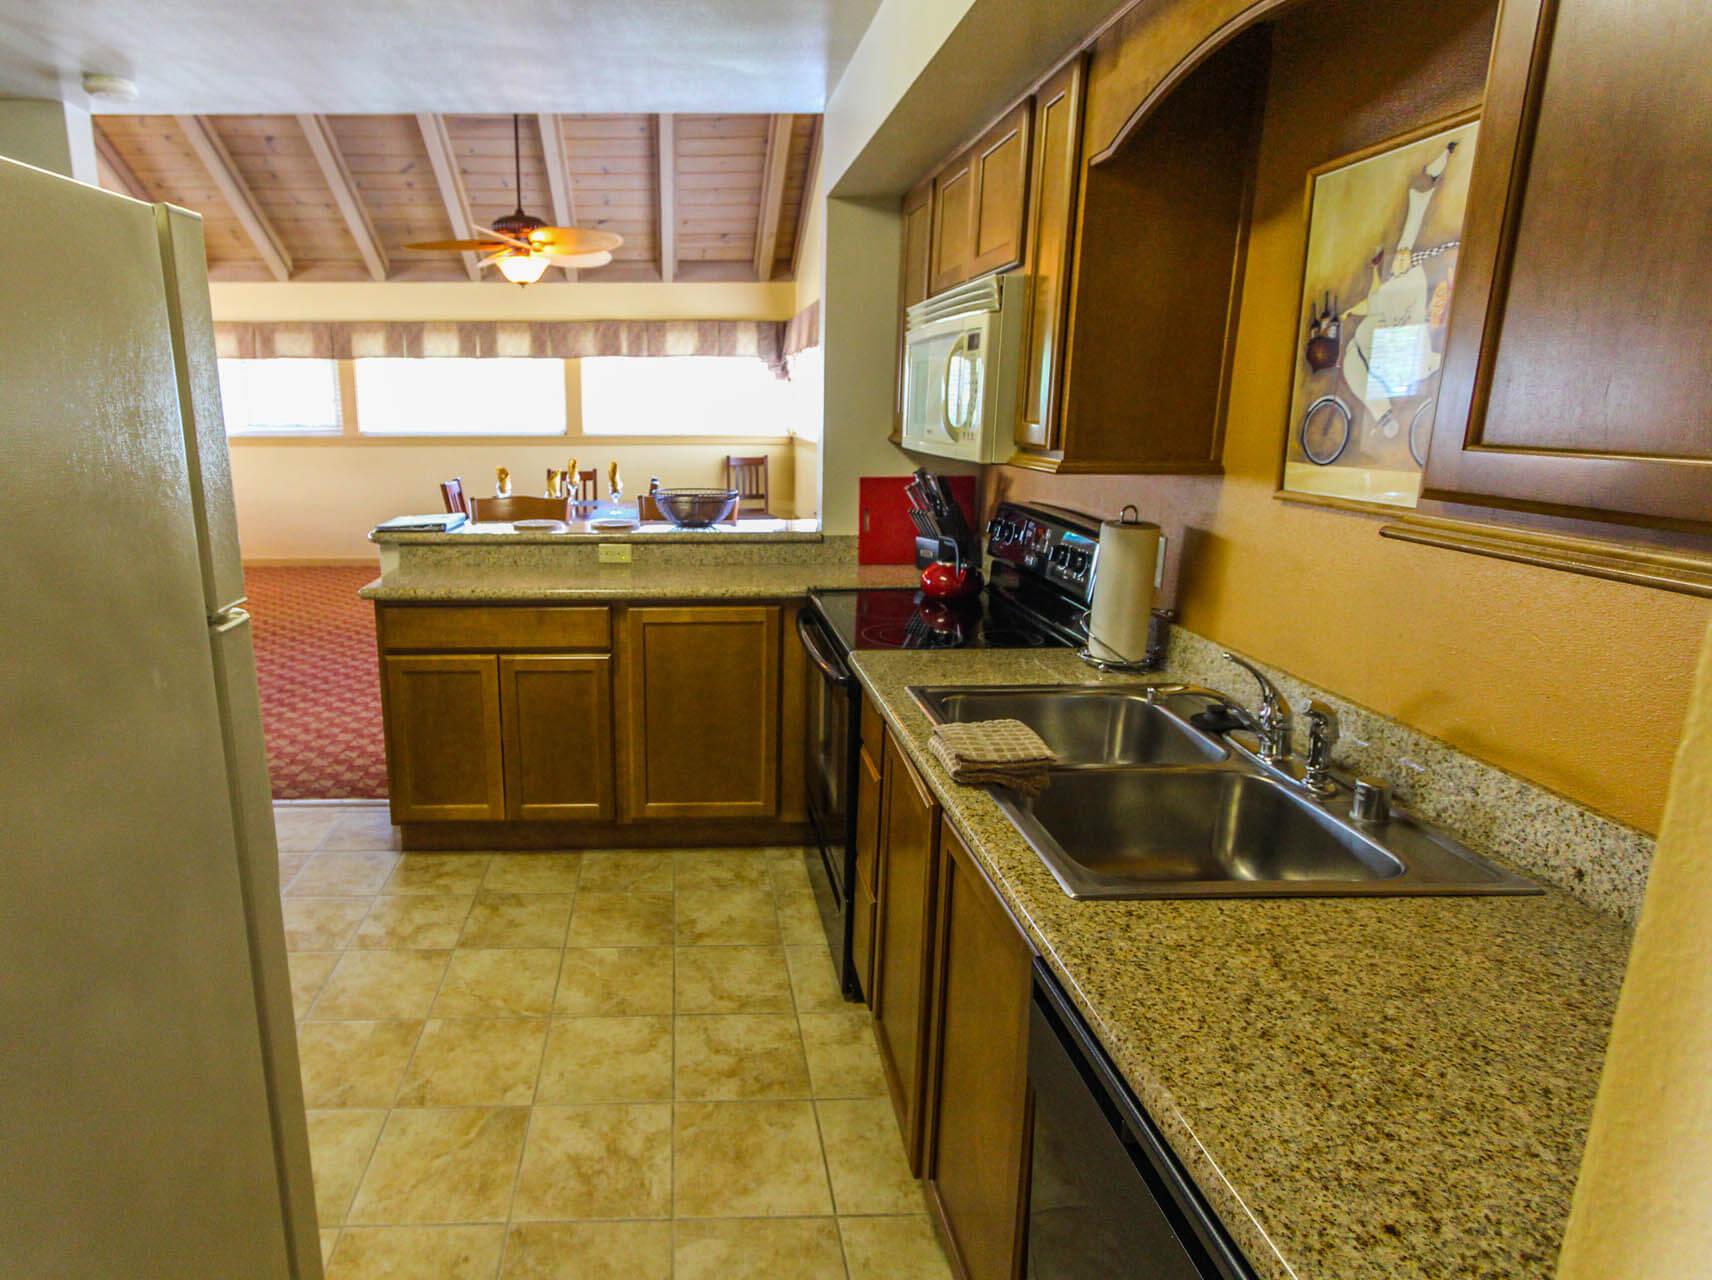 Pacific Grove Plaza Kitchen